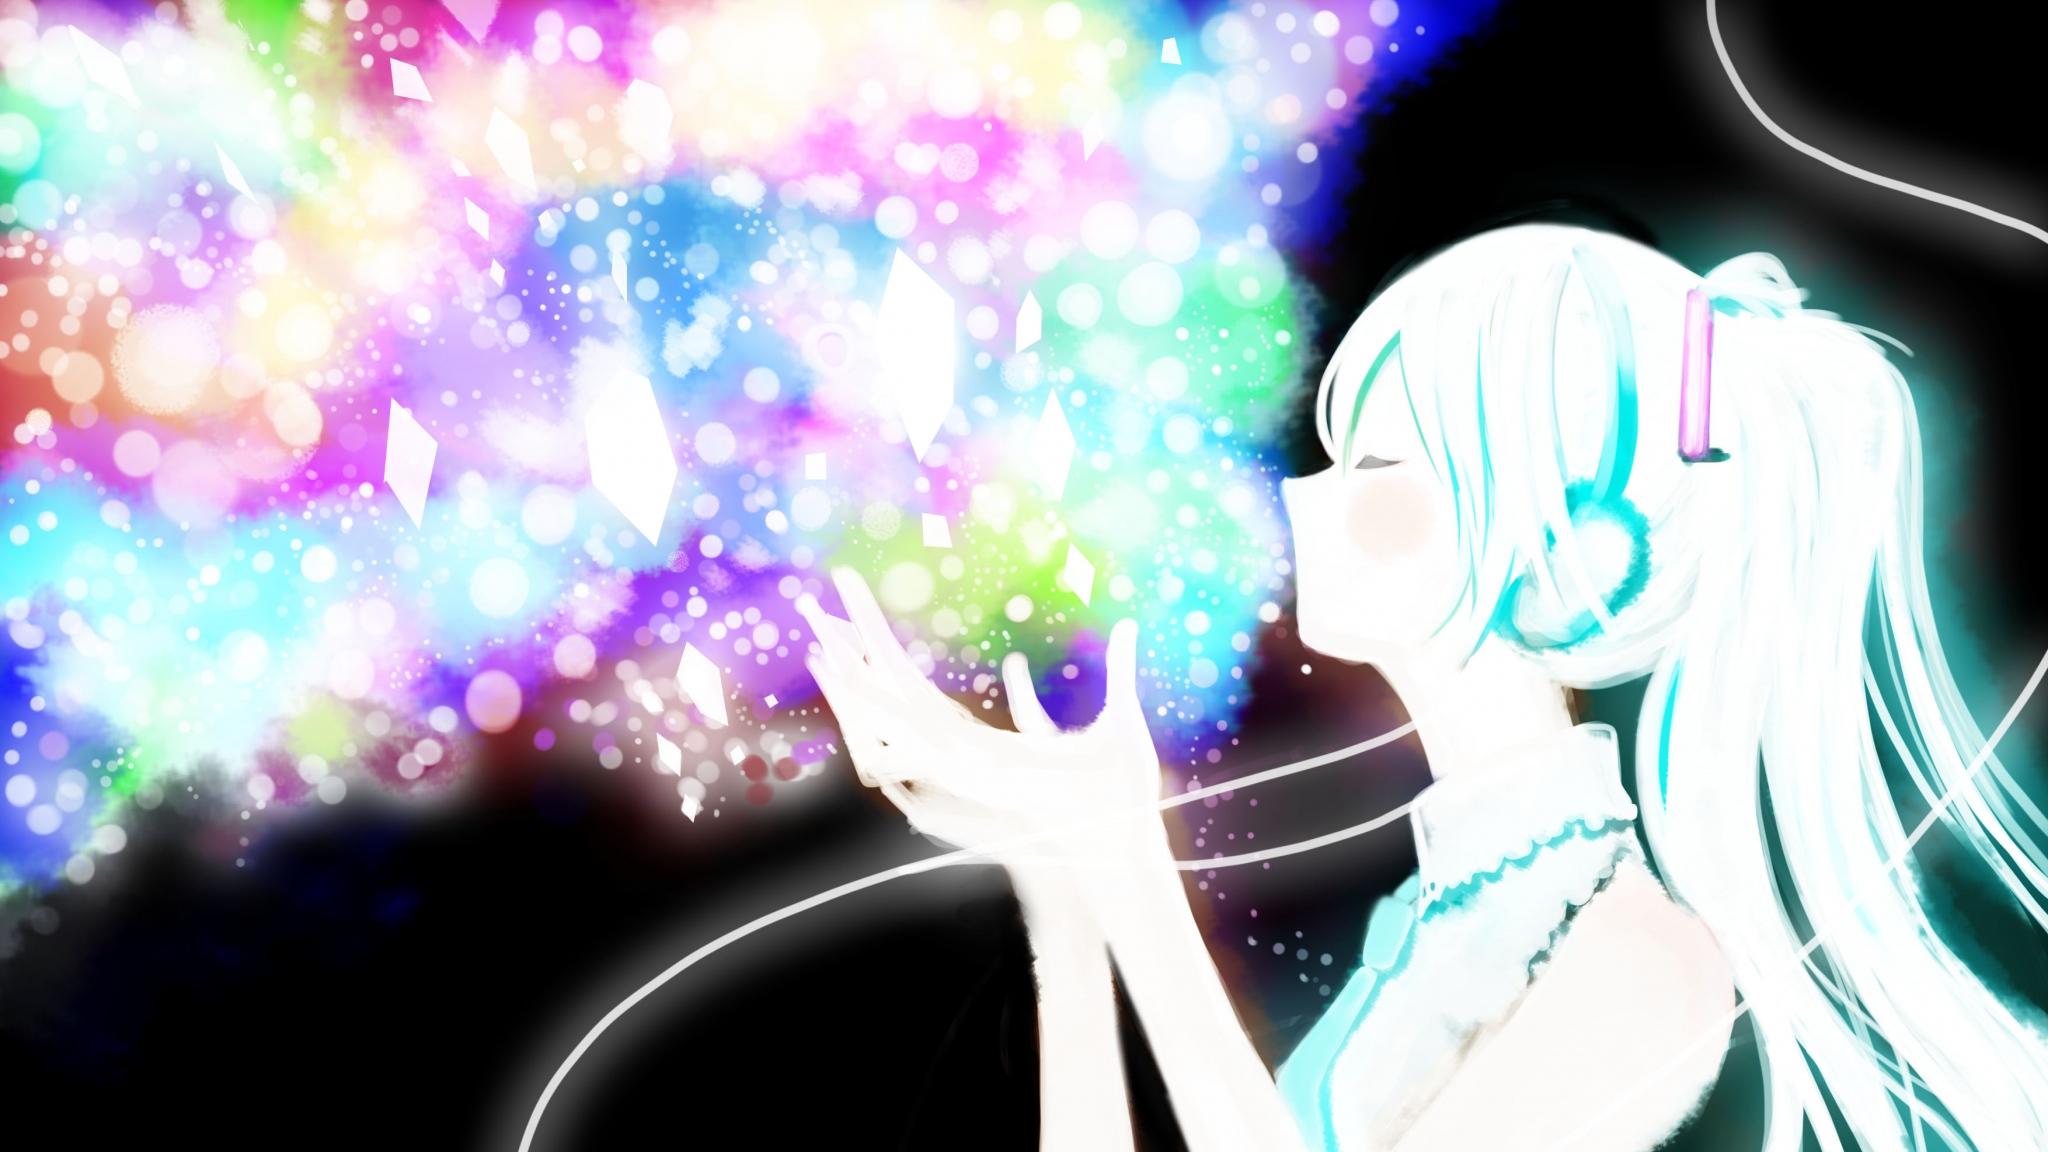 50 2048x1152 anime wallpaper on wallpapersafari - Anime background for youtube ...